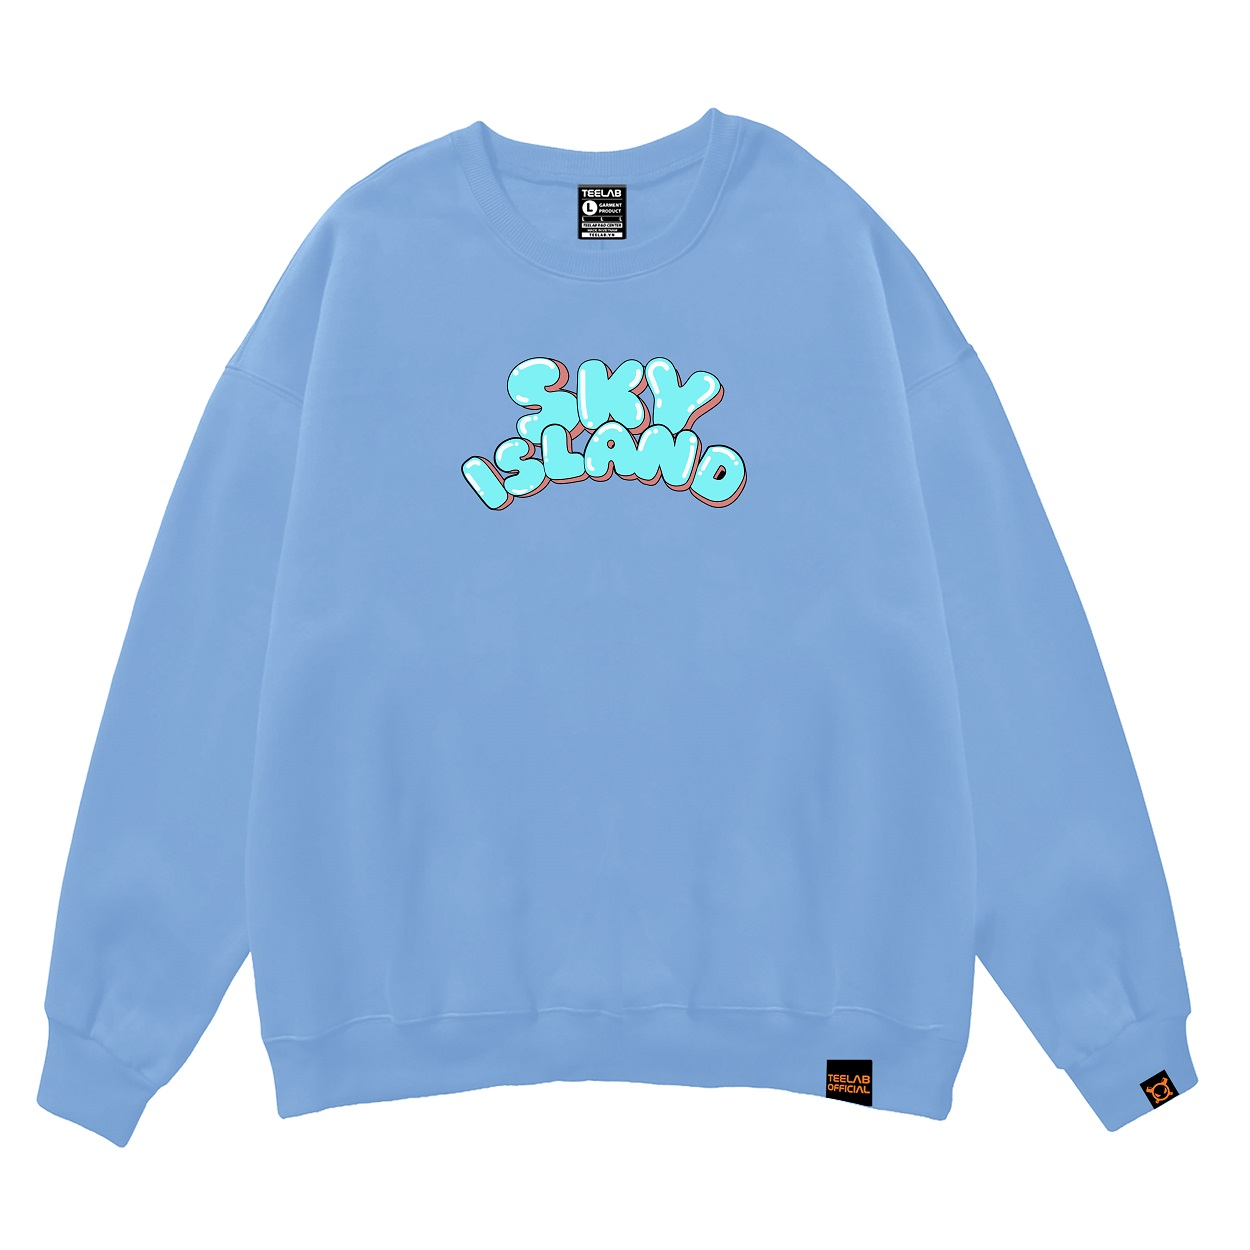 Áo Sweater Teelab Sky Island LS022